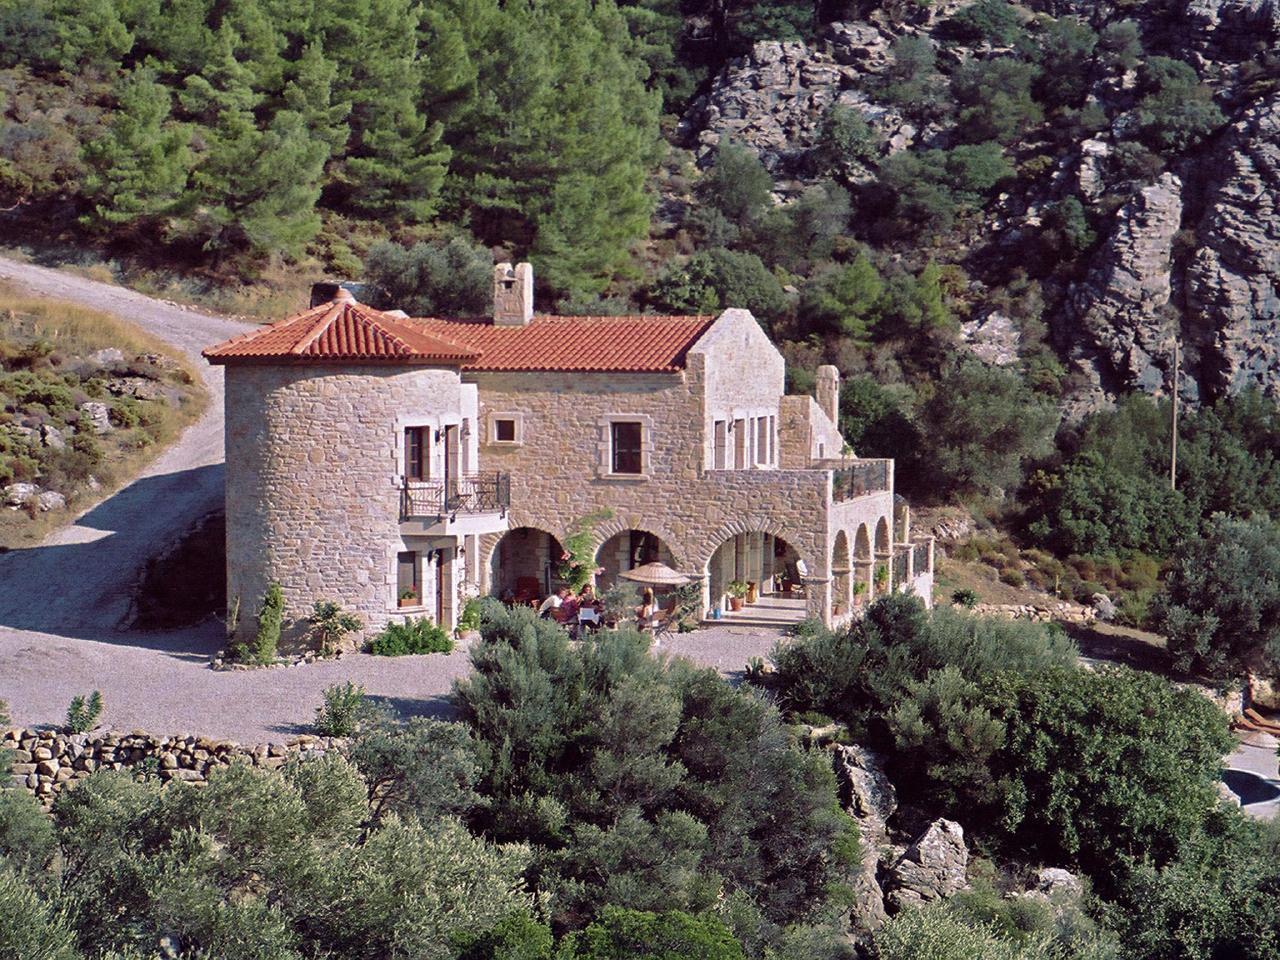 Maison de vacances Exklusives Chalet, romantisch am Berghang und Meer gelegen (2506674), Mesudiye, , Région Egéenne, Turquie, image 22